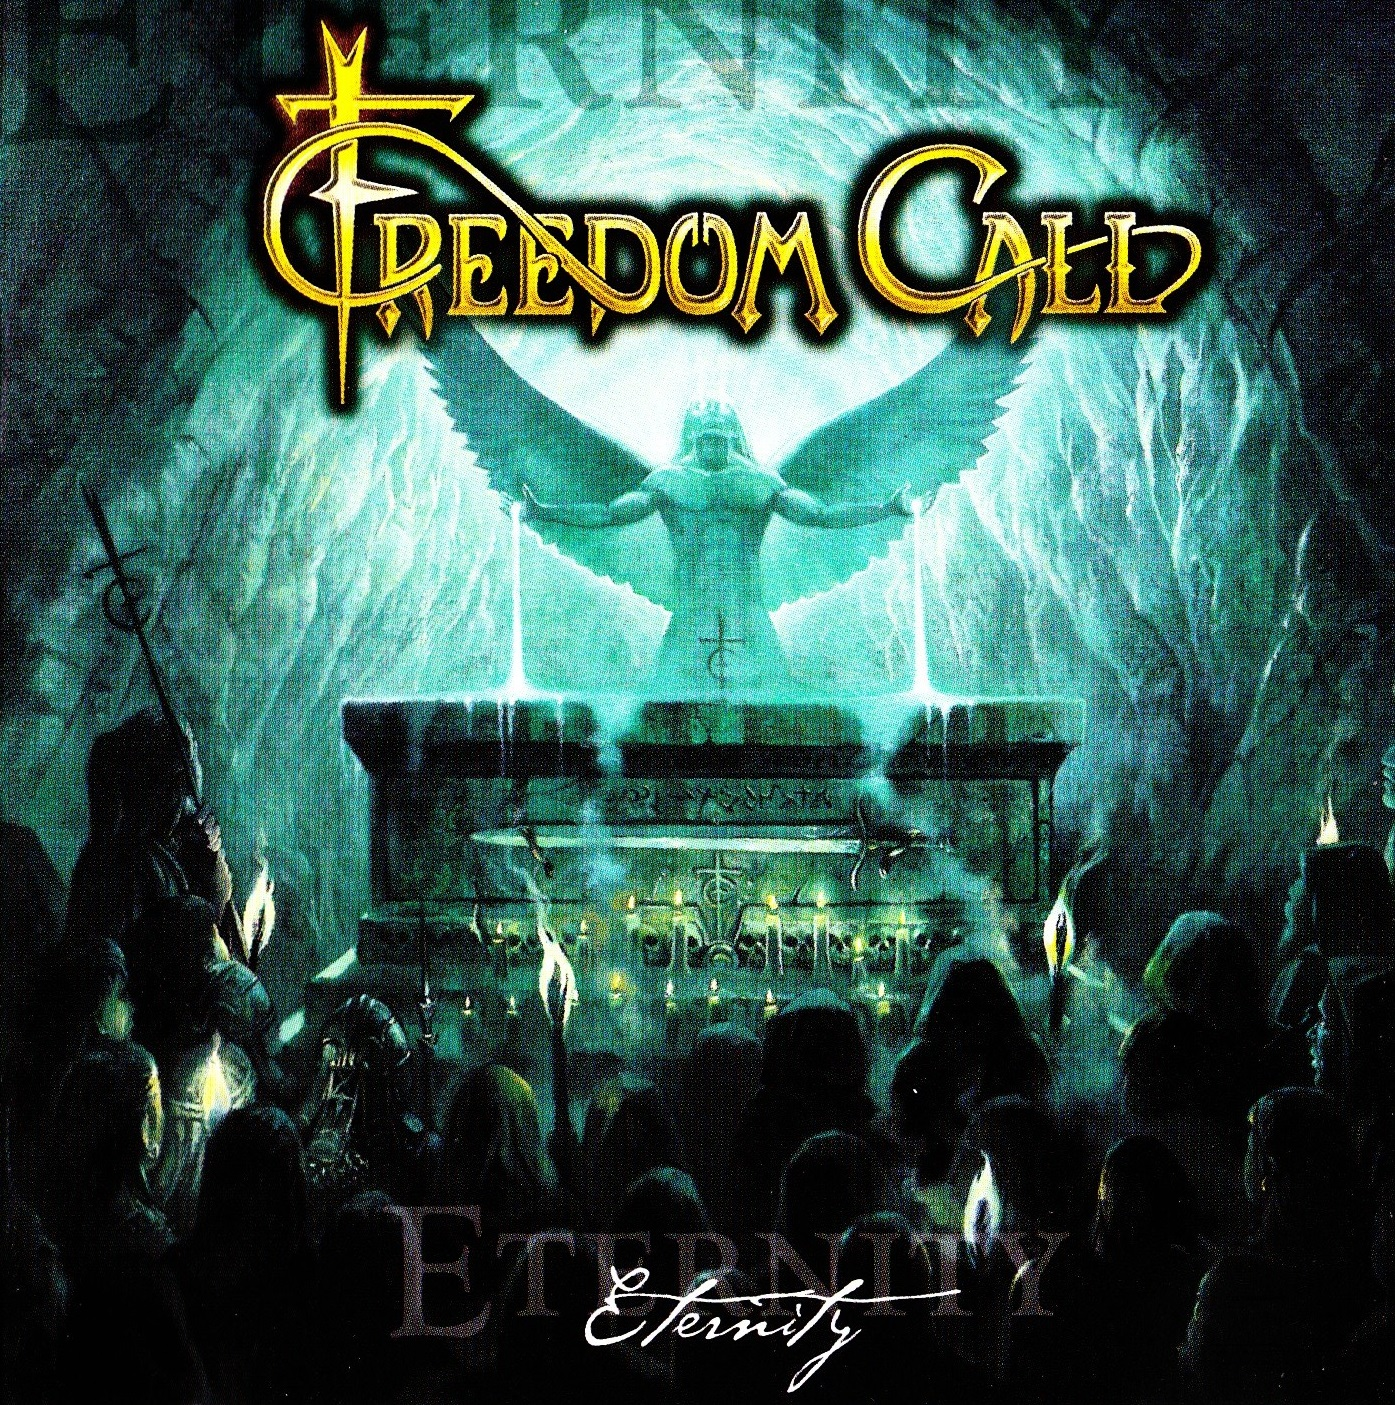 Freedom Call — Eternity (2002)